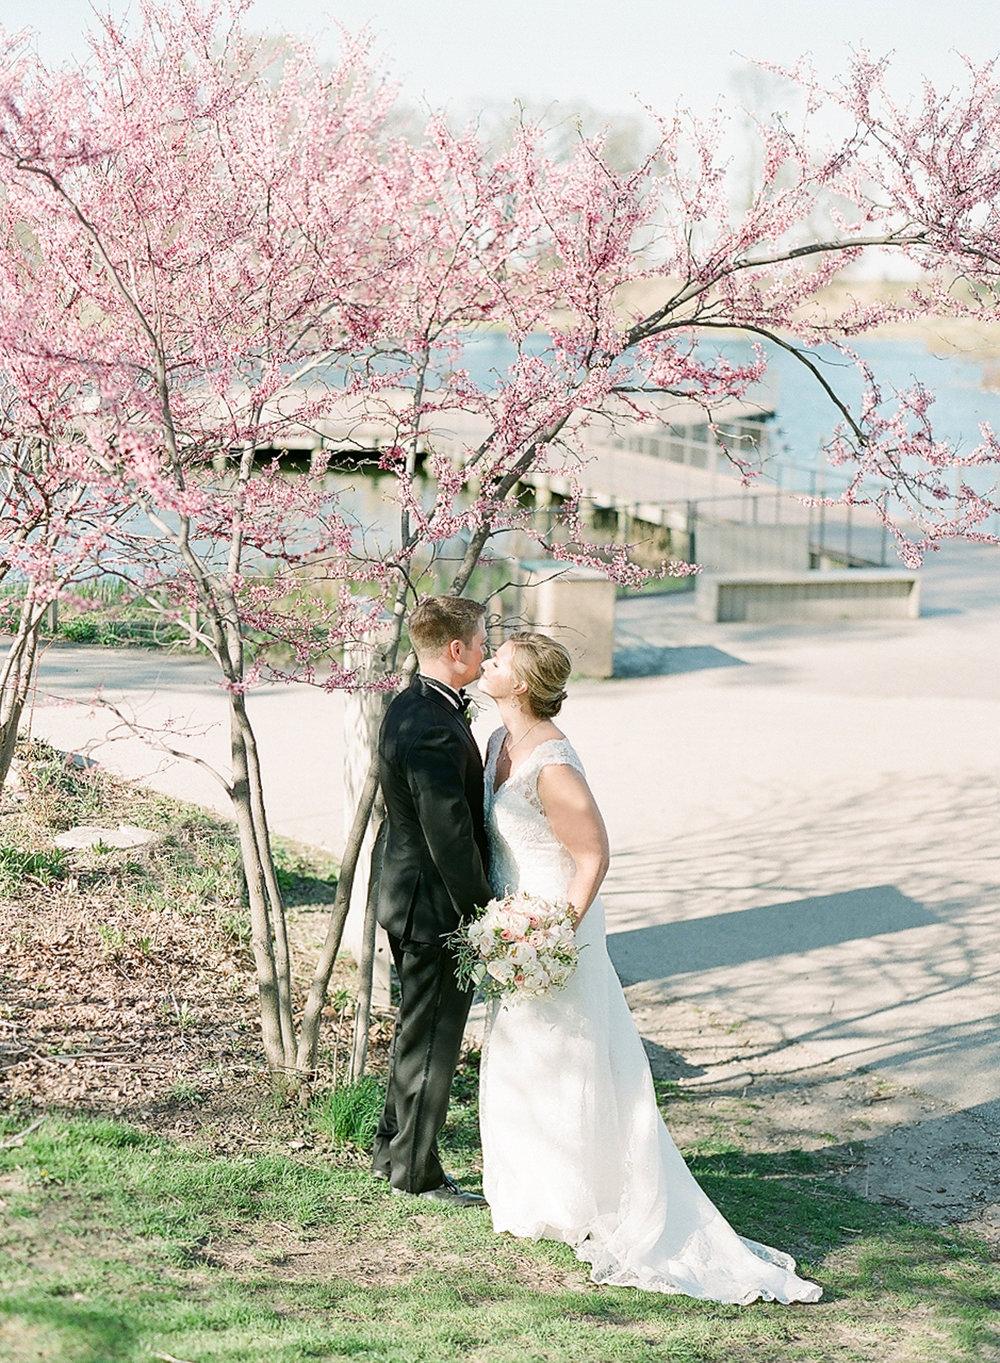 Chicago Fine Art Wedding Photography - Lincoln Park